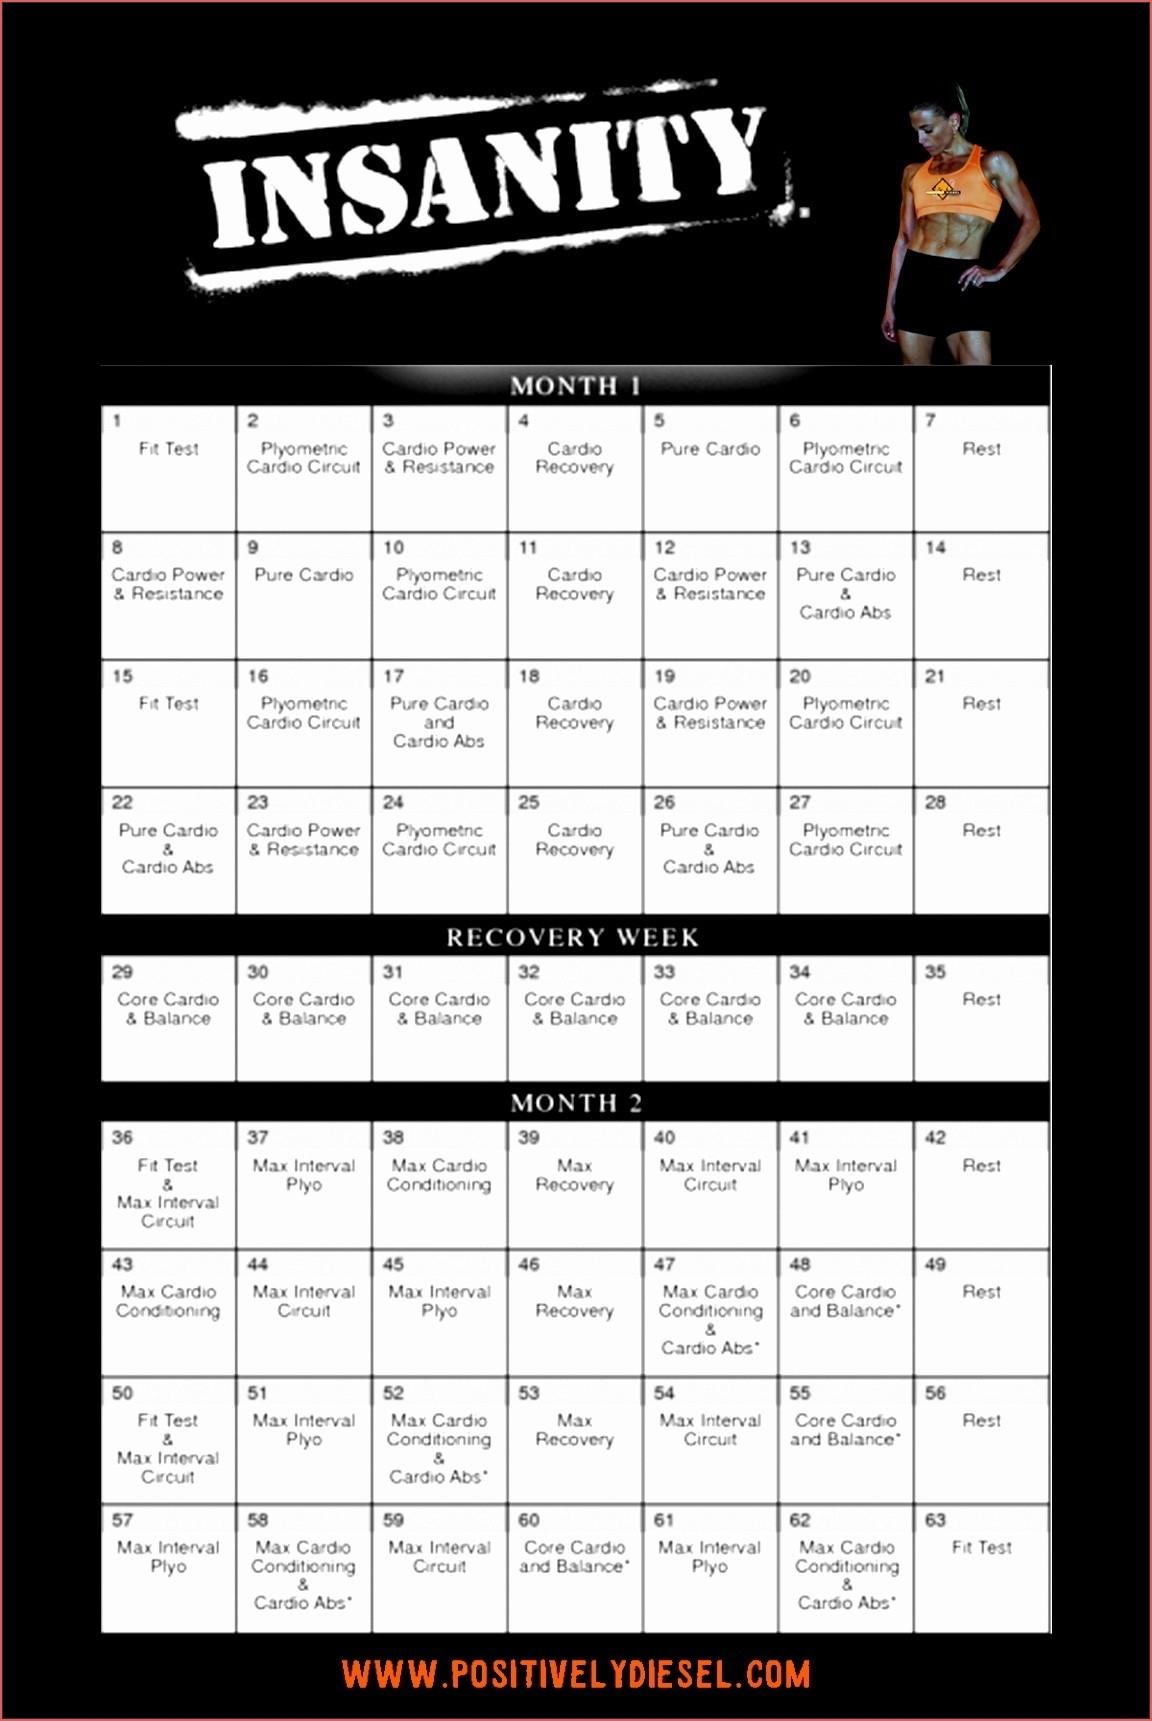 Beachbody Insanity Calendar Online Calendar Templates Printable with regard to The Insanity 60 Day Wall Calendar